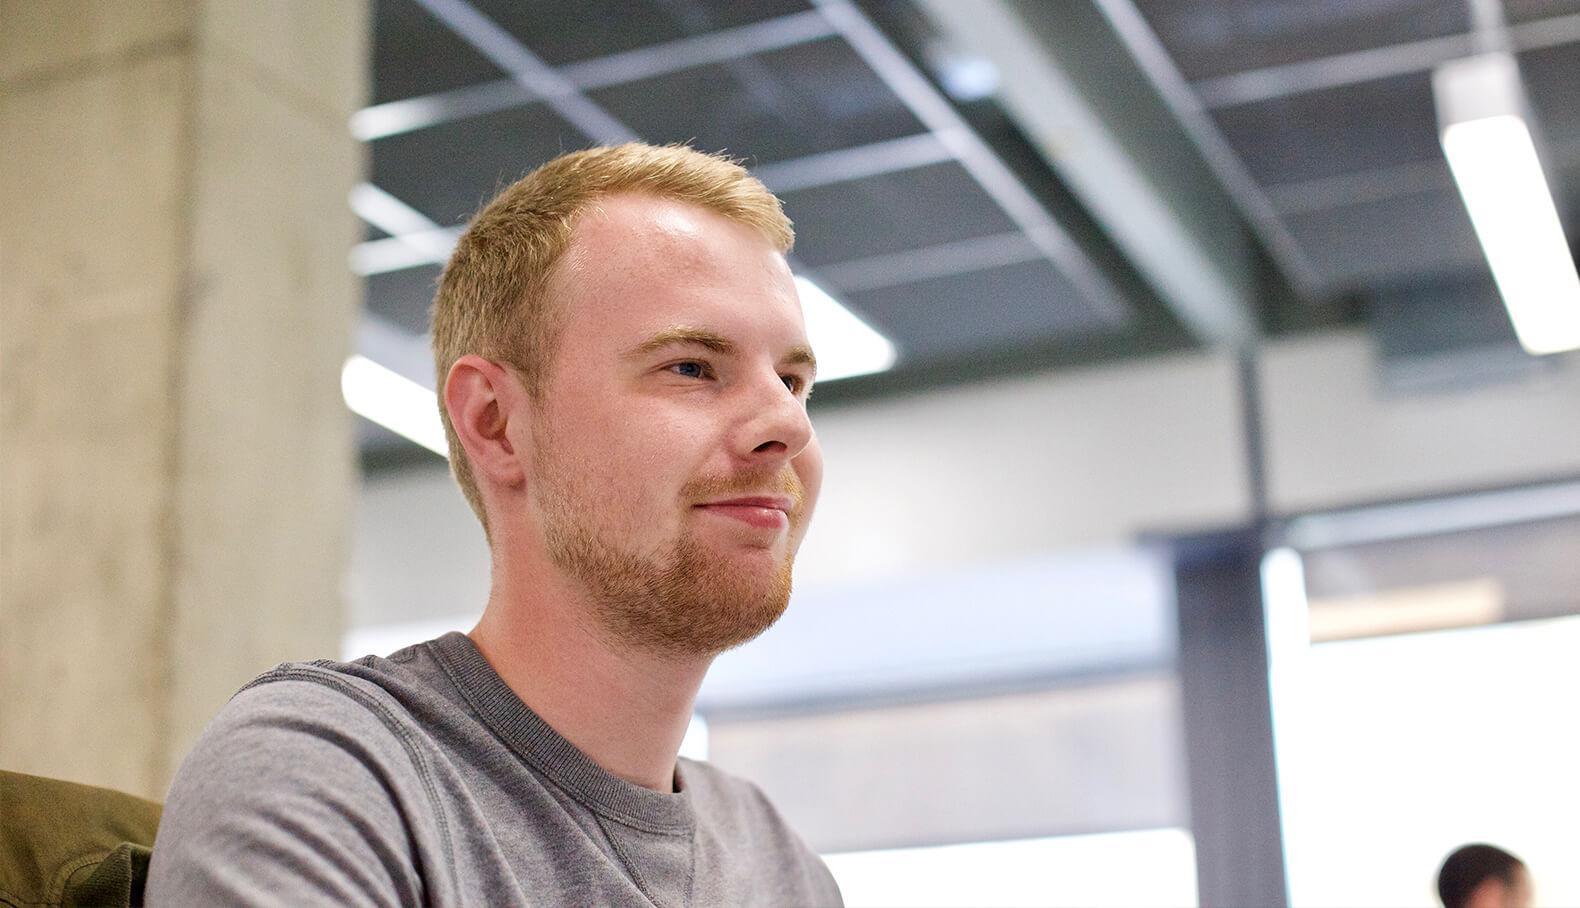 ray discussing cloud desktop workspace